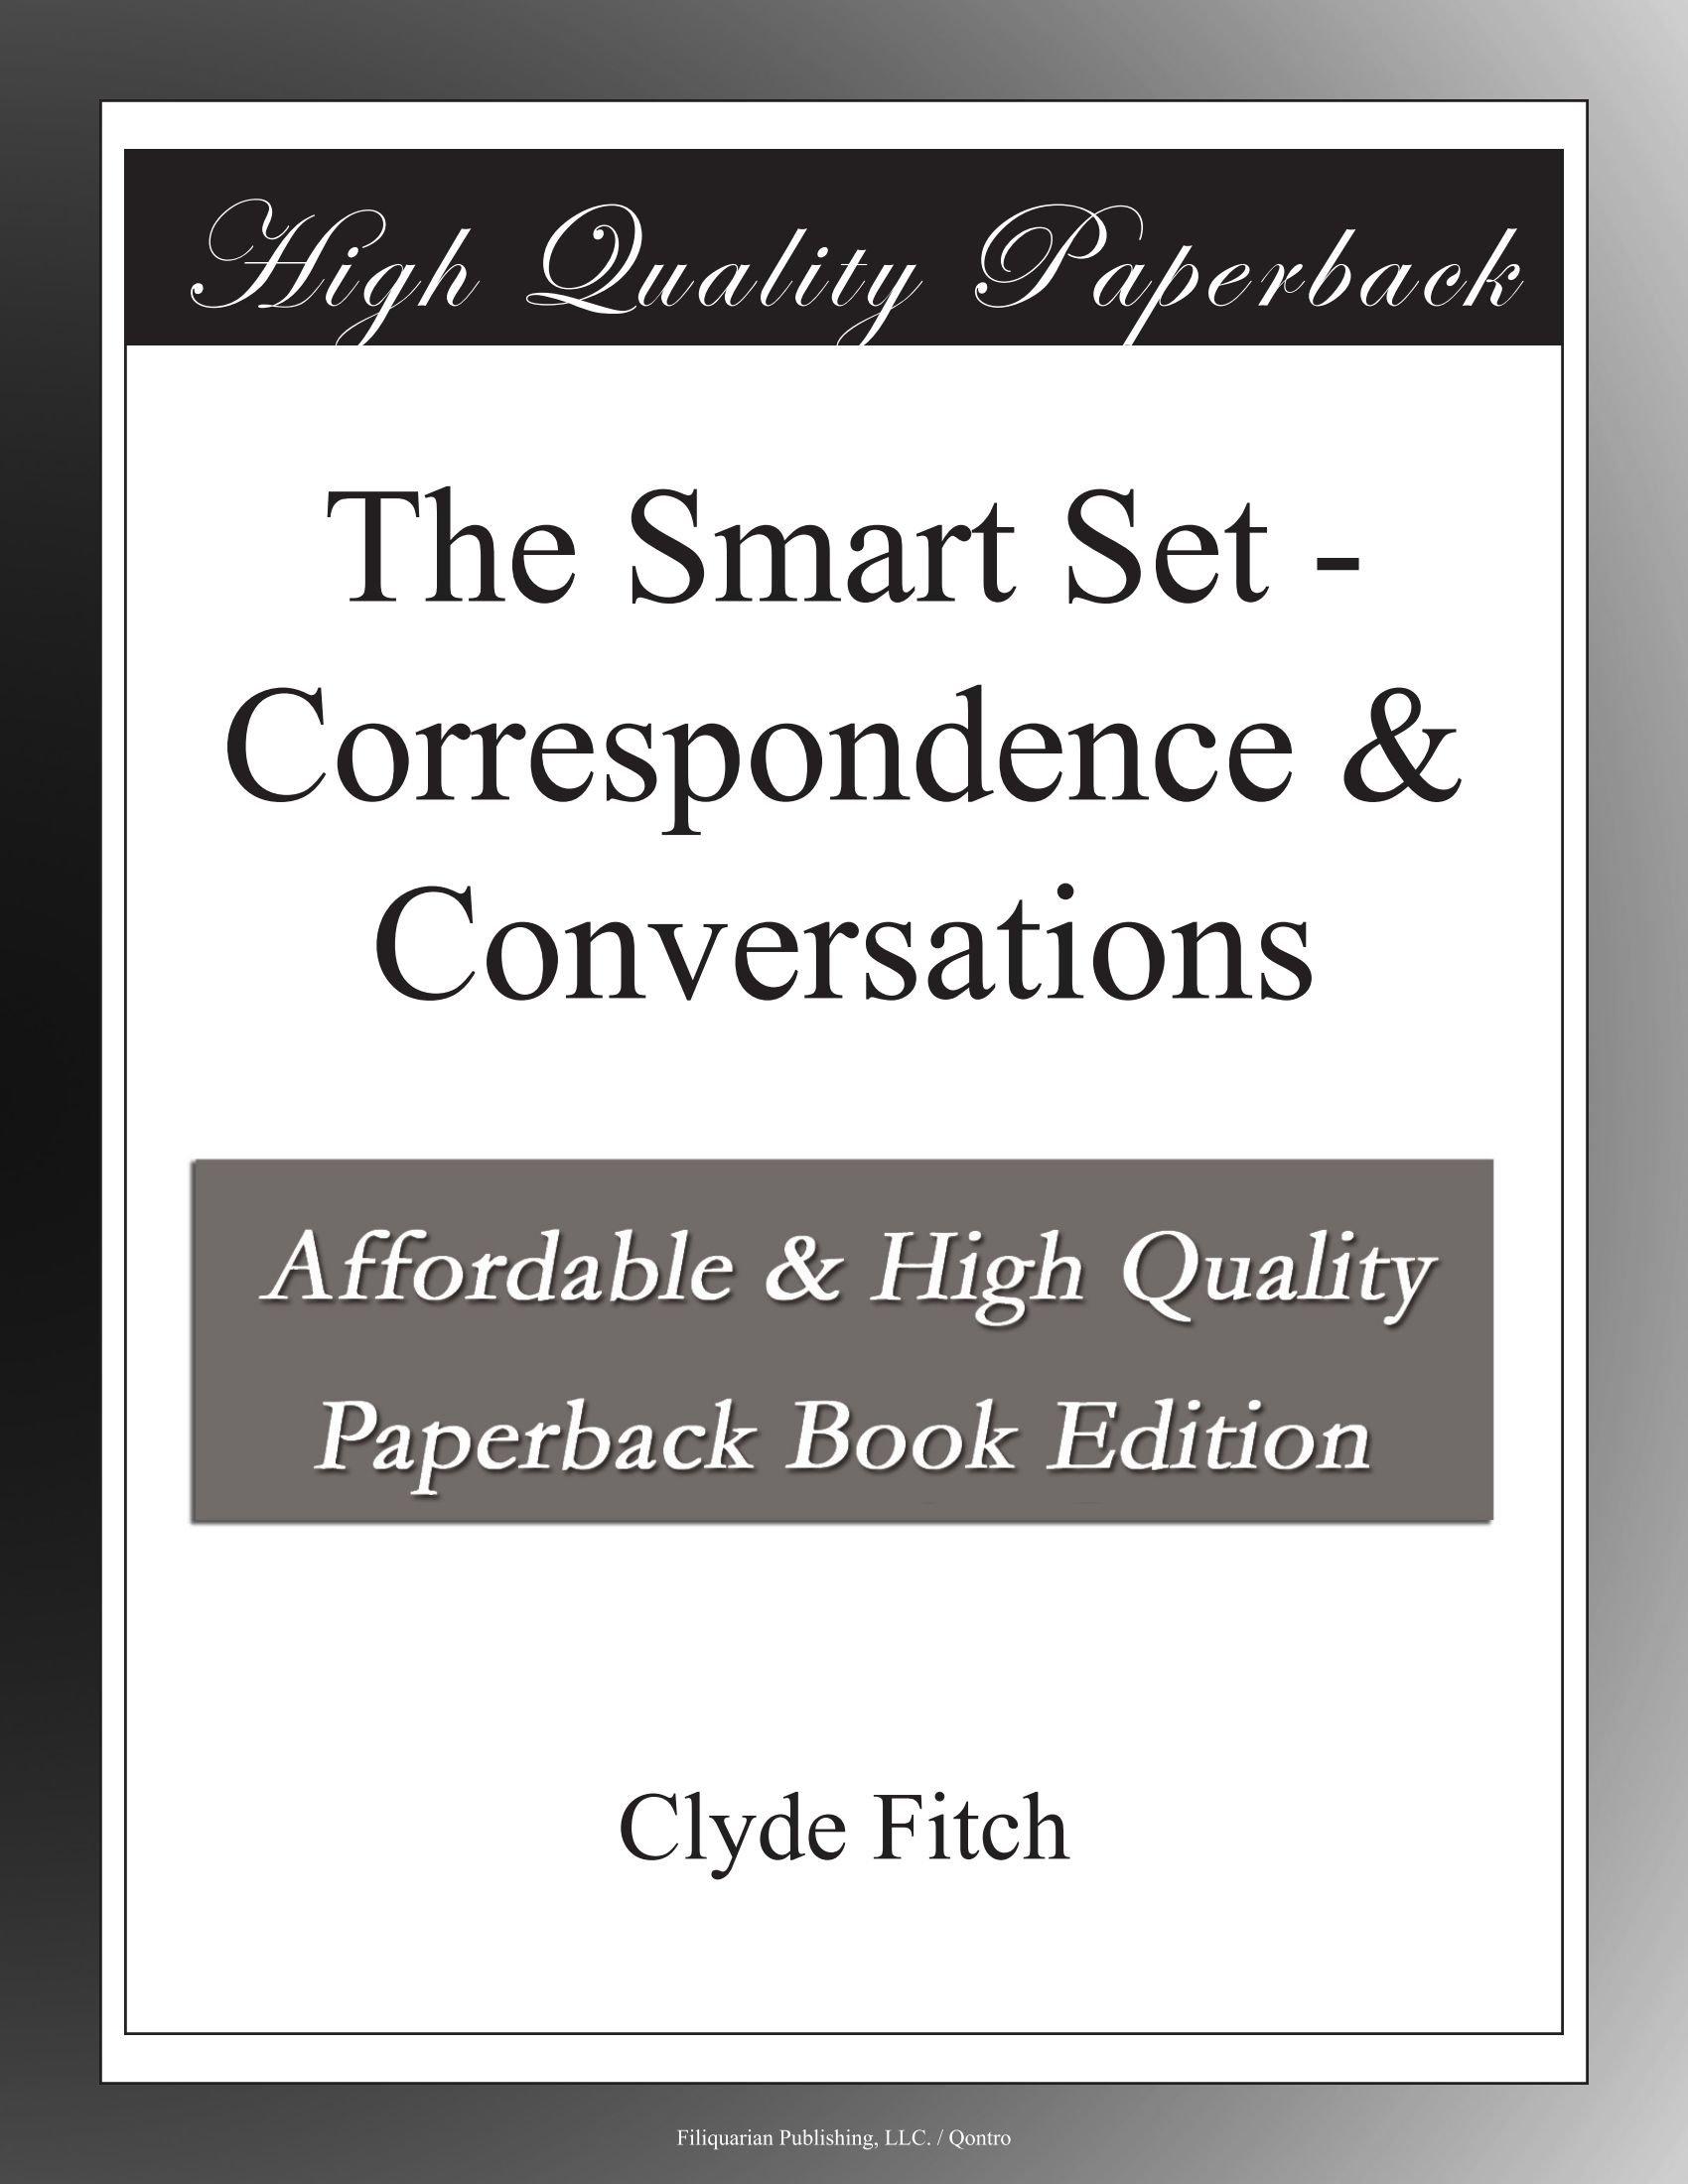 The Smart Set Correspondence & Conversations